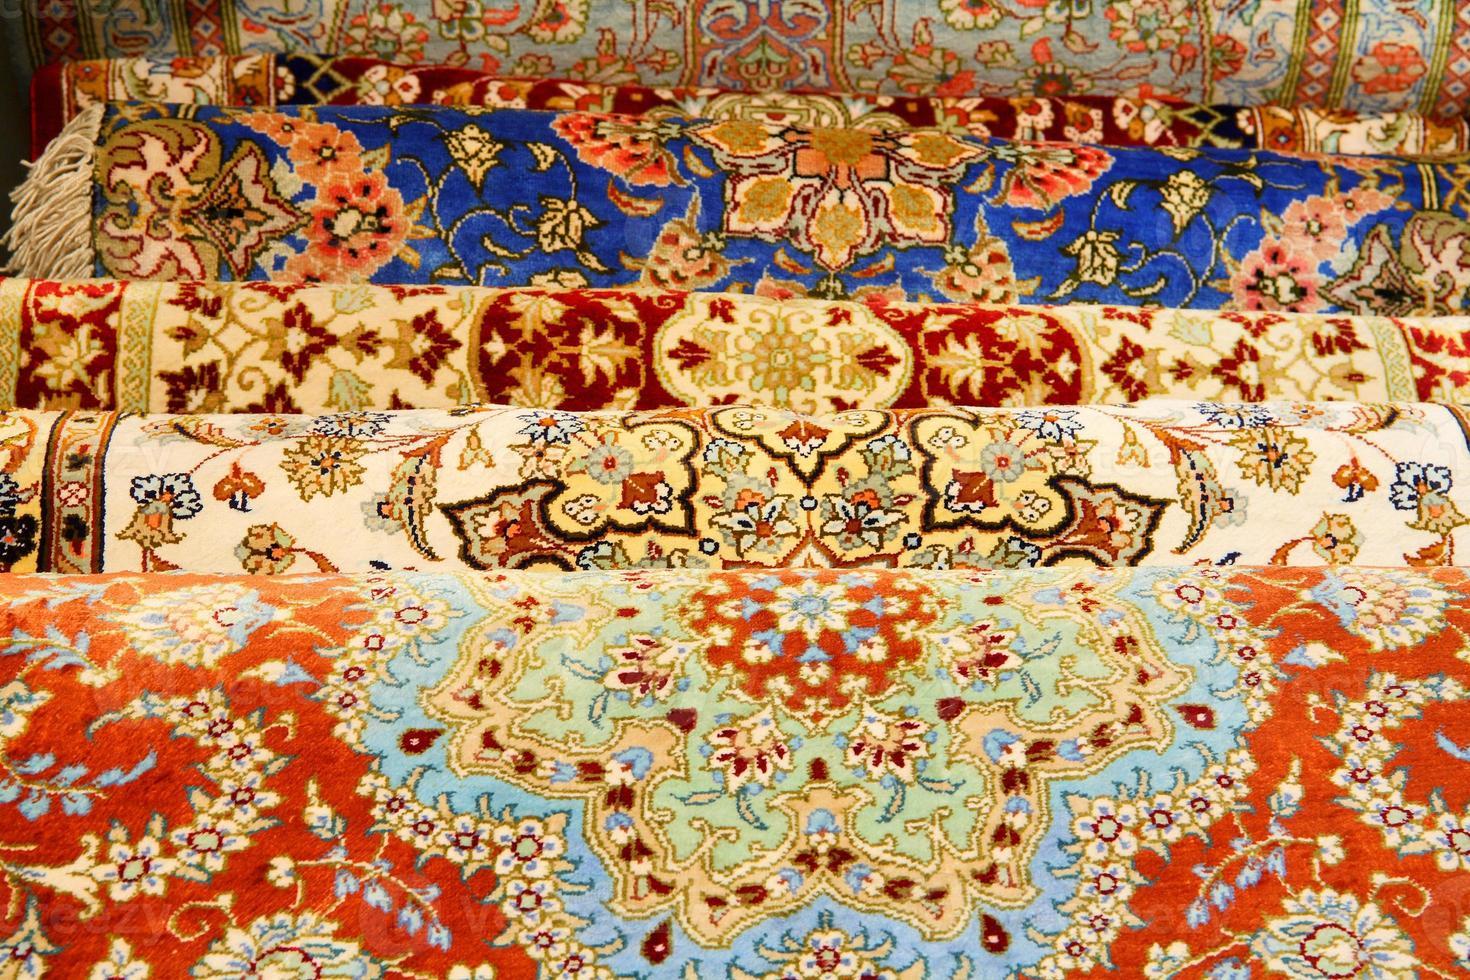 Many vibrant multicolored Persian carpets photo